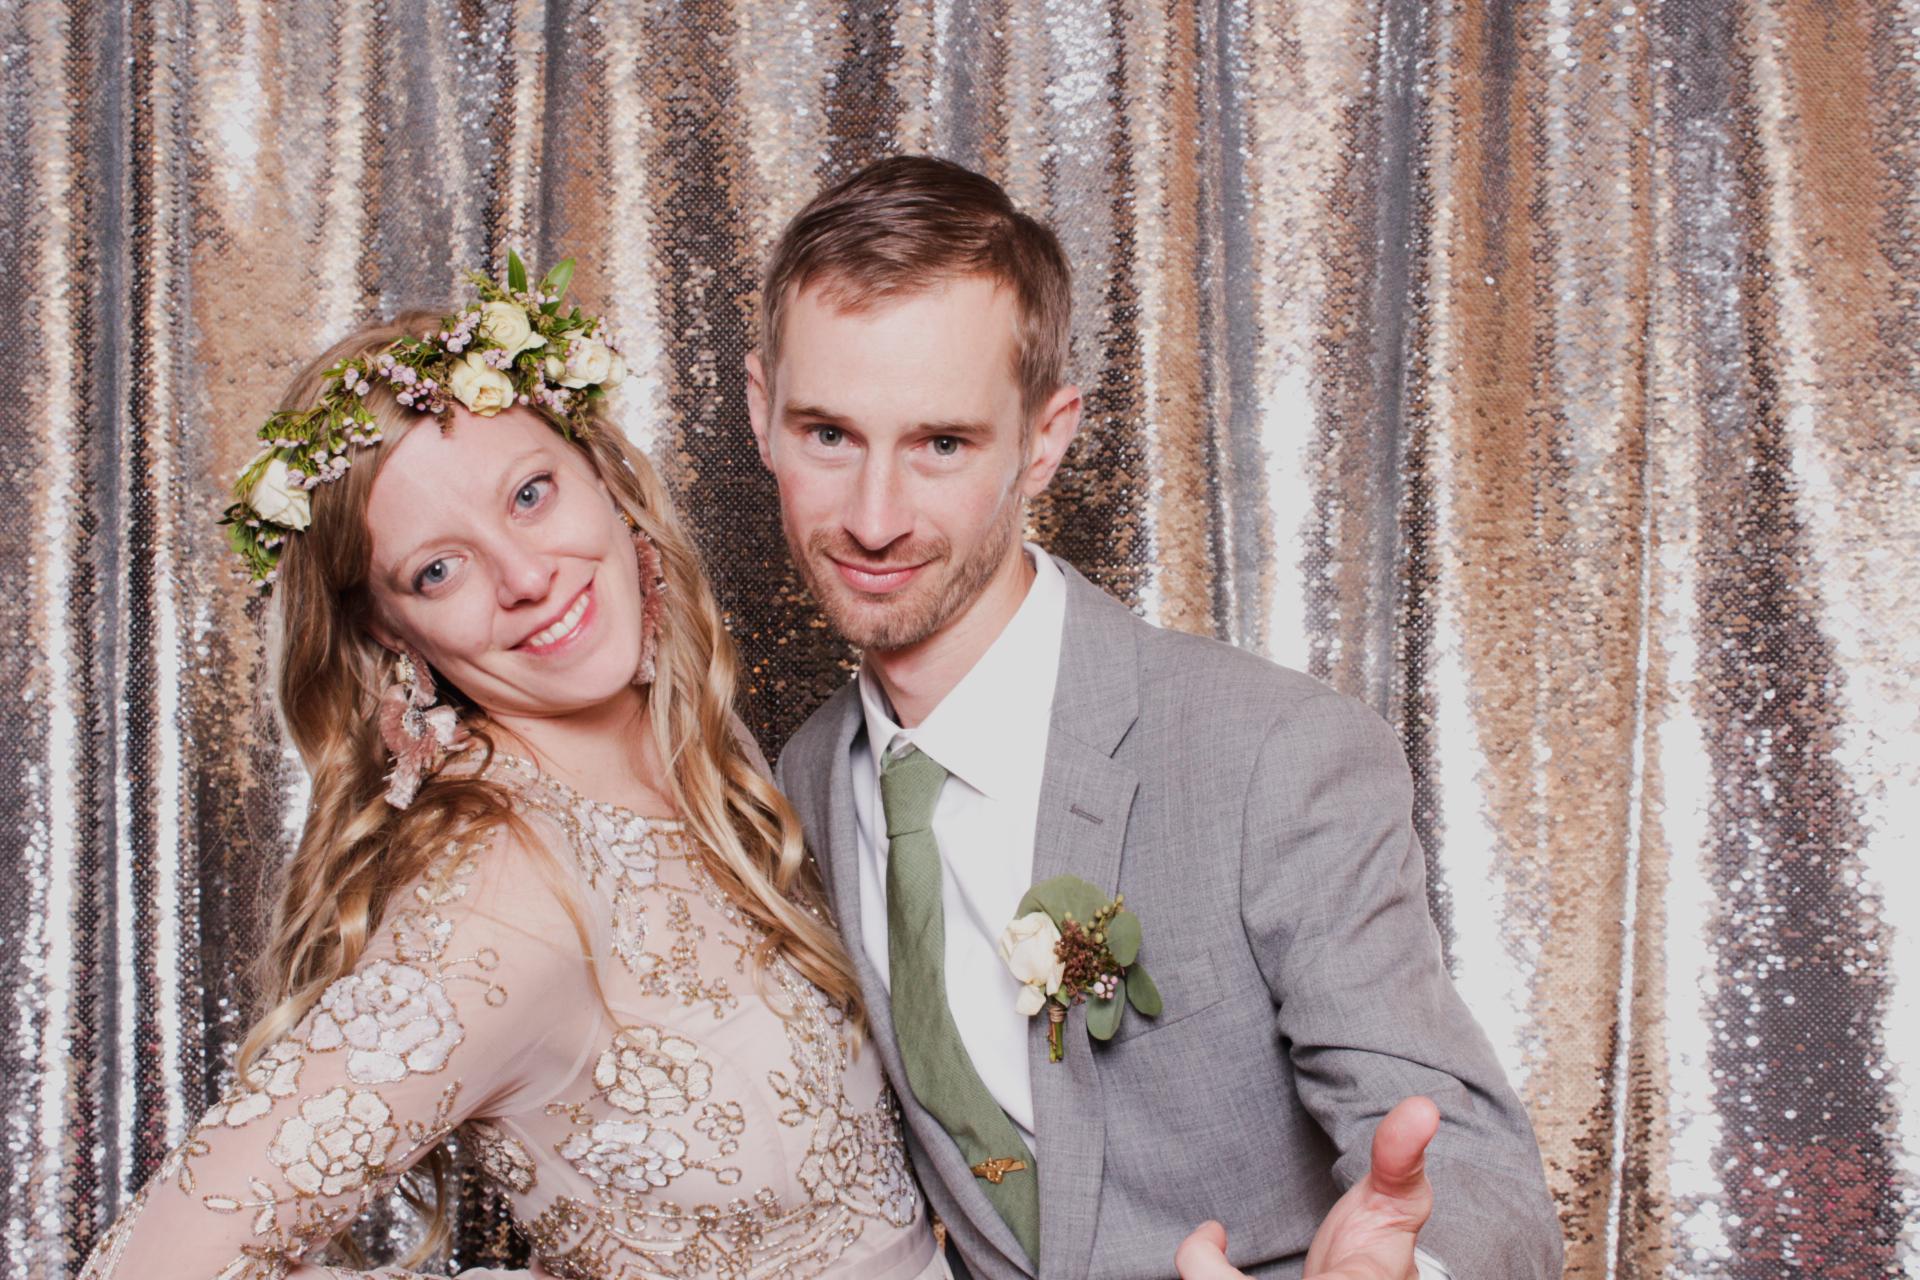 cheap wedding photo booth